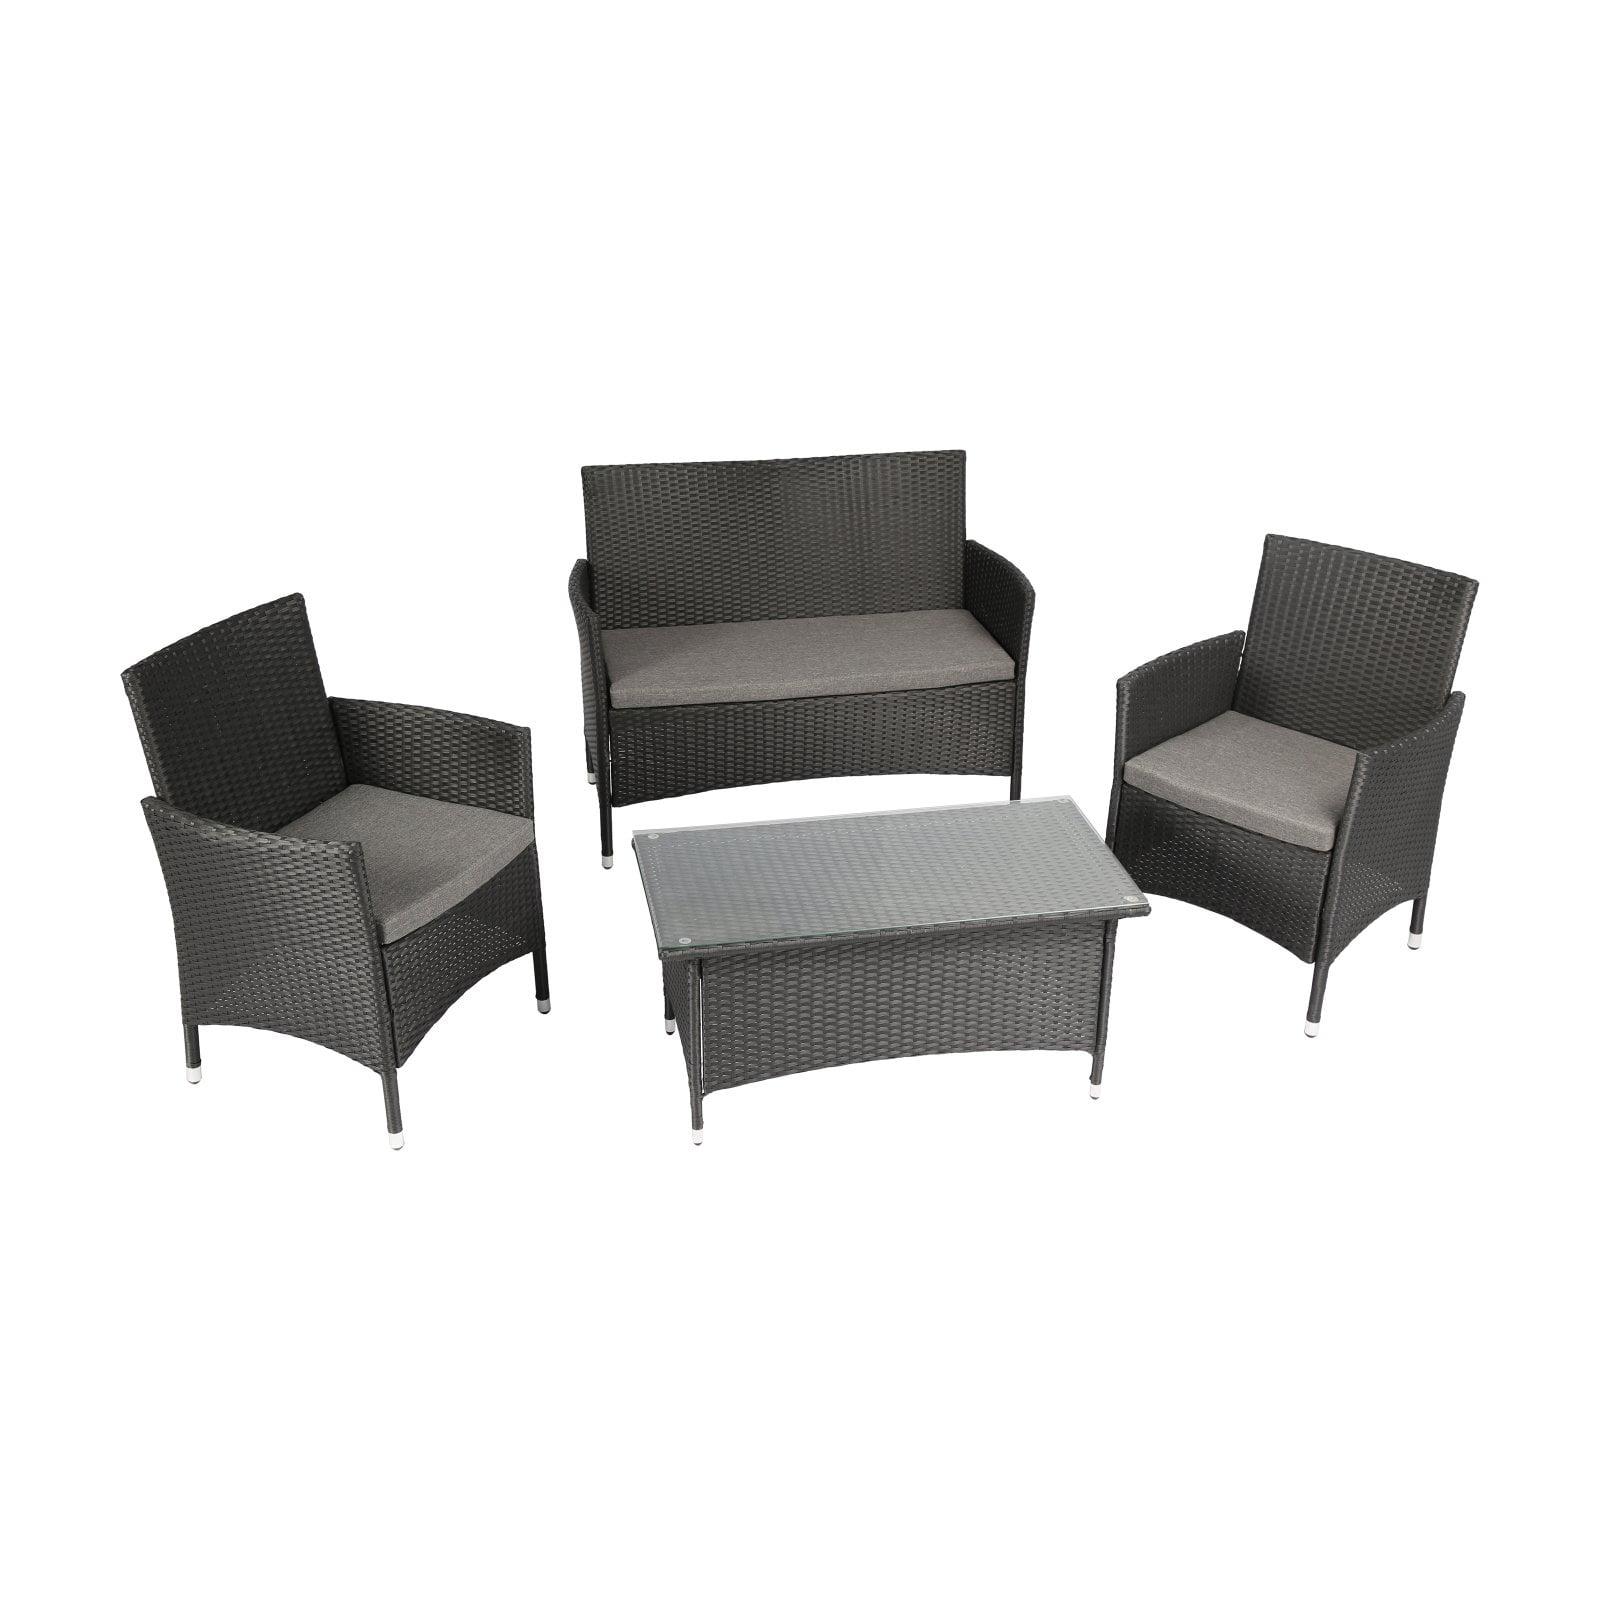 3f653ac78725 Baner Garden Outdoor Furniture Complete Patio Cushion PE Wicker Rattan  Garden Set, Brown, 4-Pieces - Walmart.com